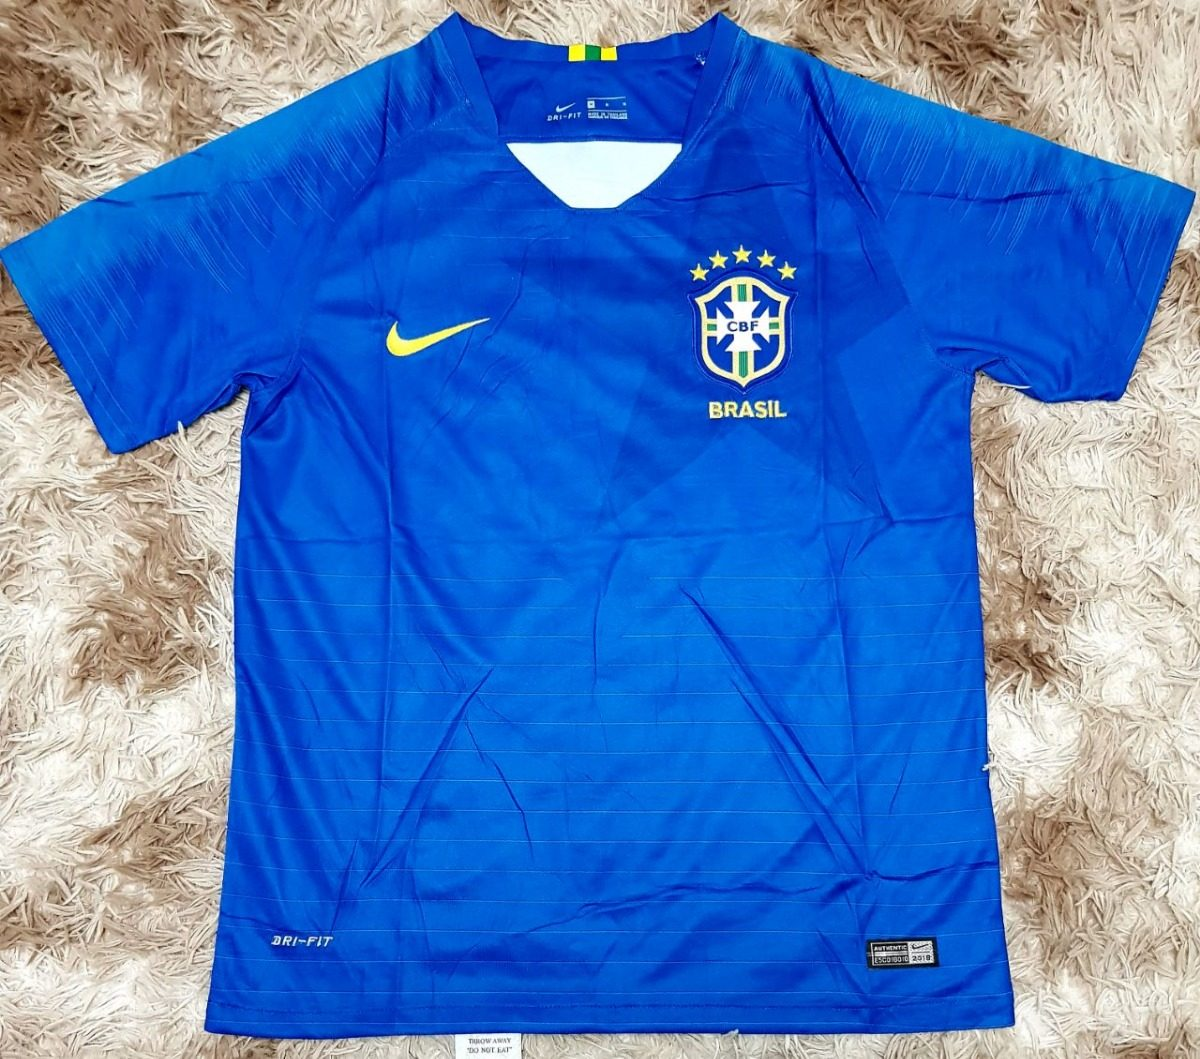 a52ba4dce2 camisa oficial brasil copa 2014 azul original fifa. Carregando zoom.